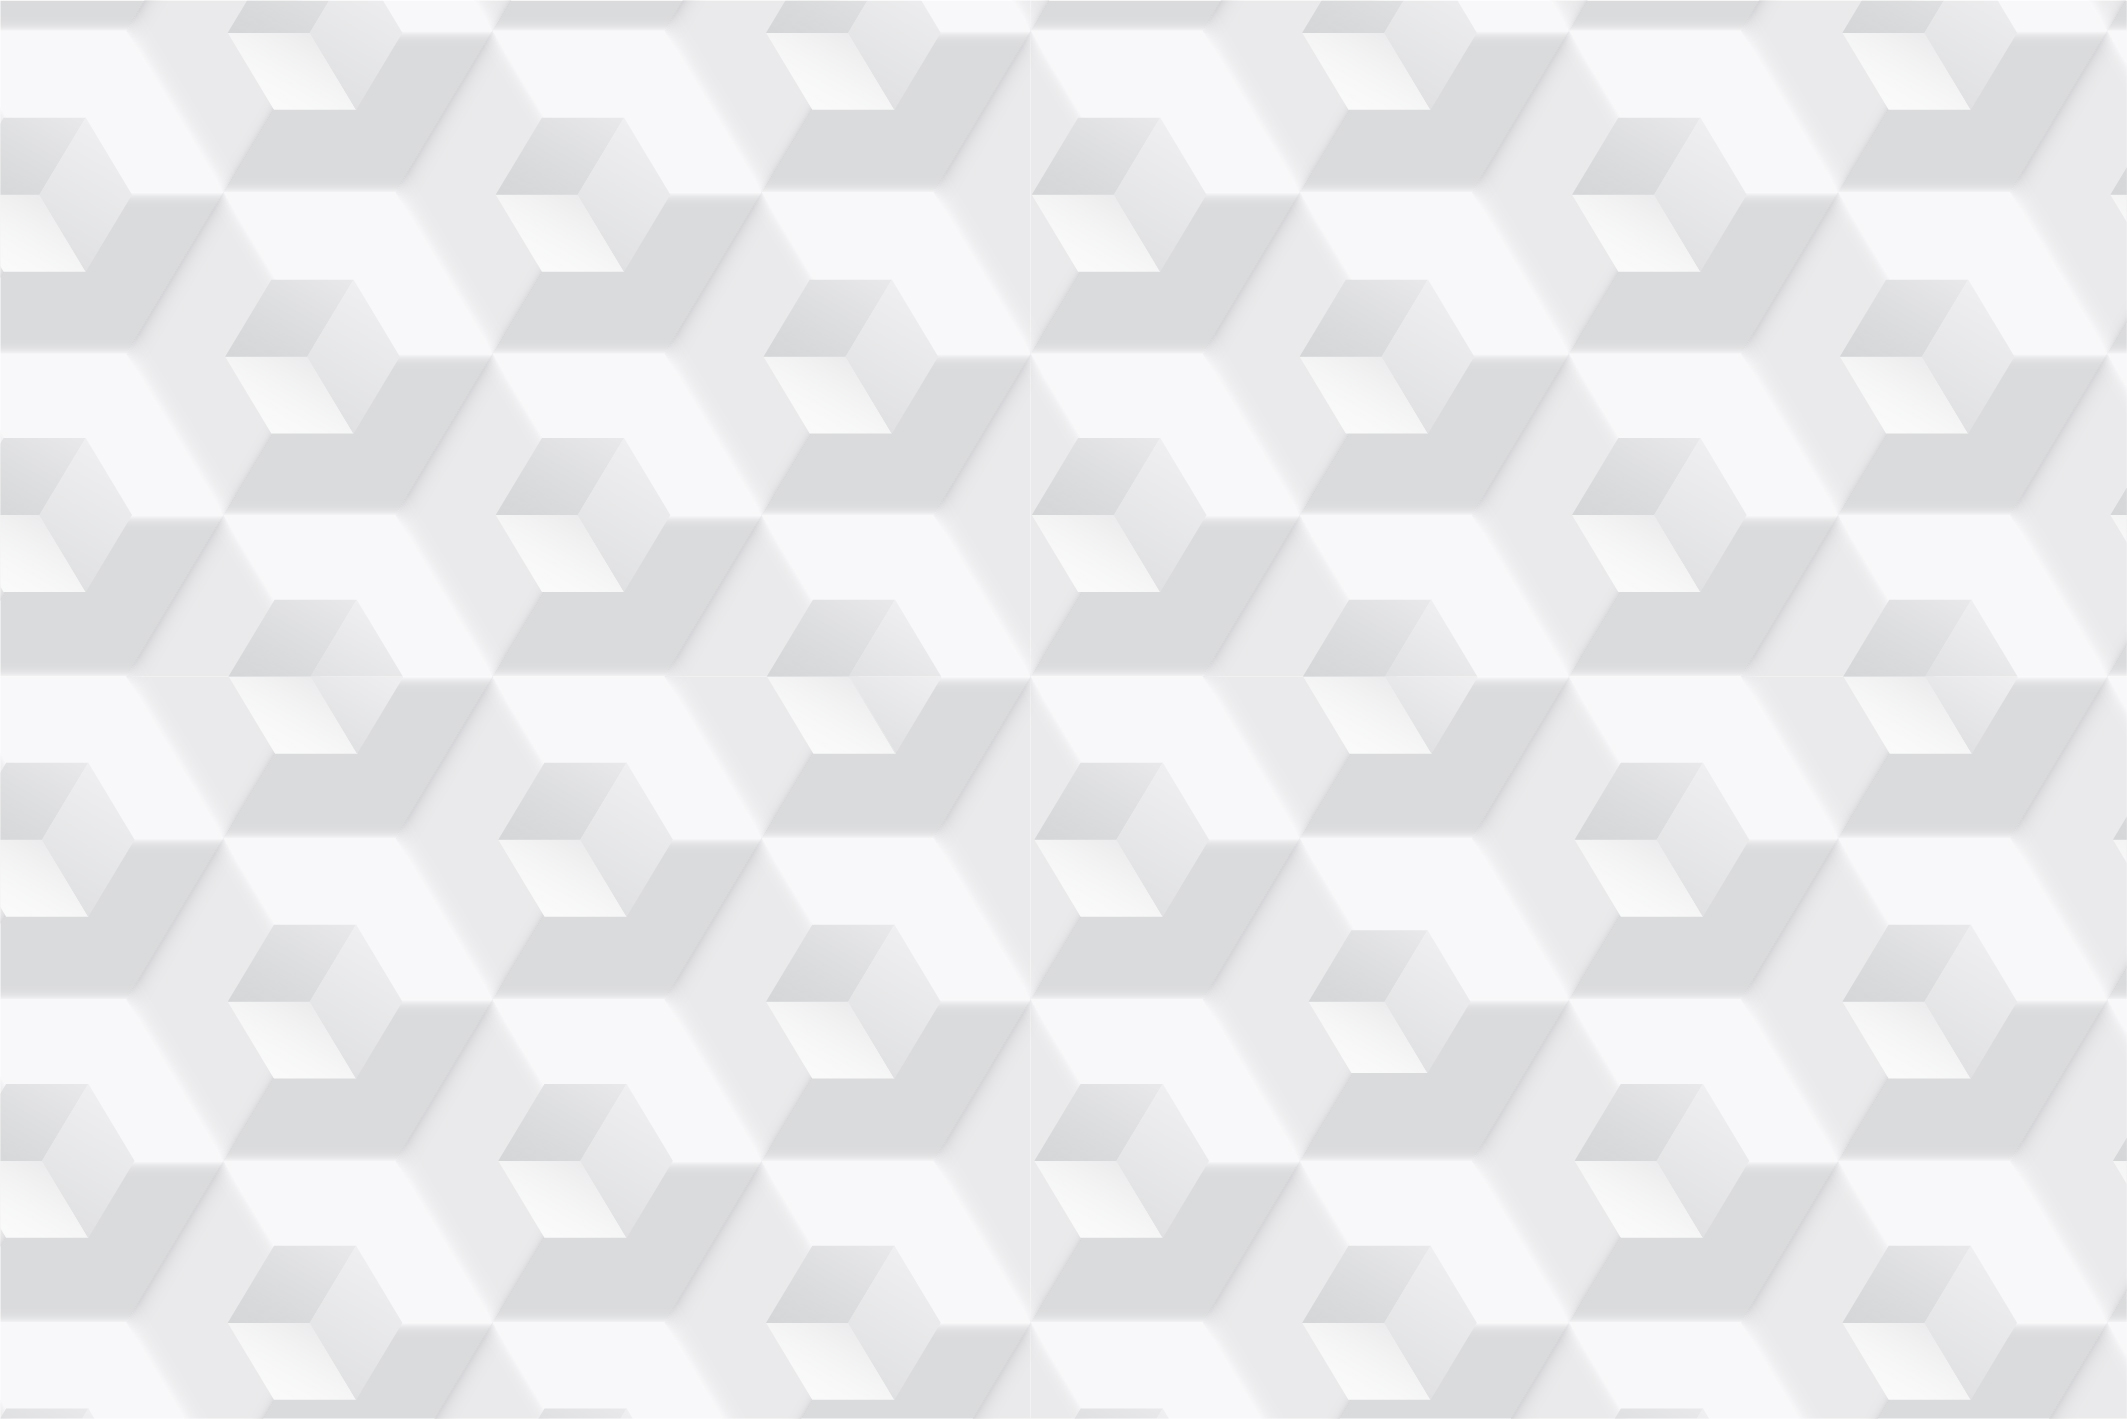 White geometric 3d seamless textures example image 8